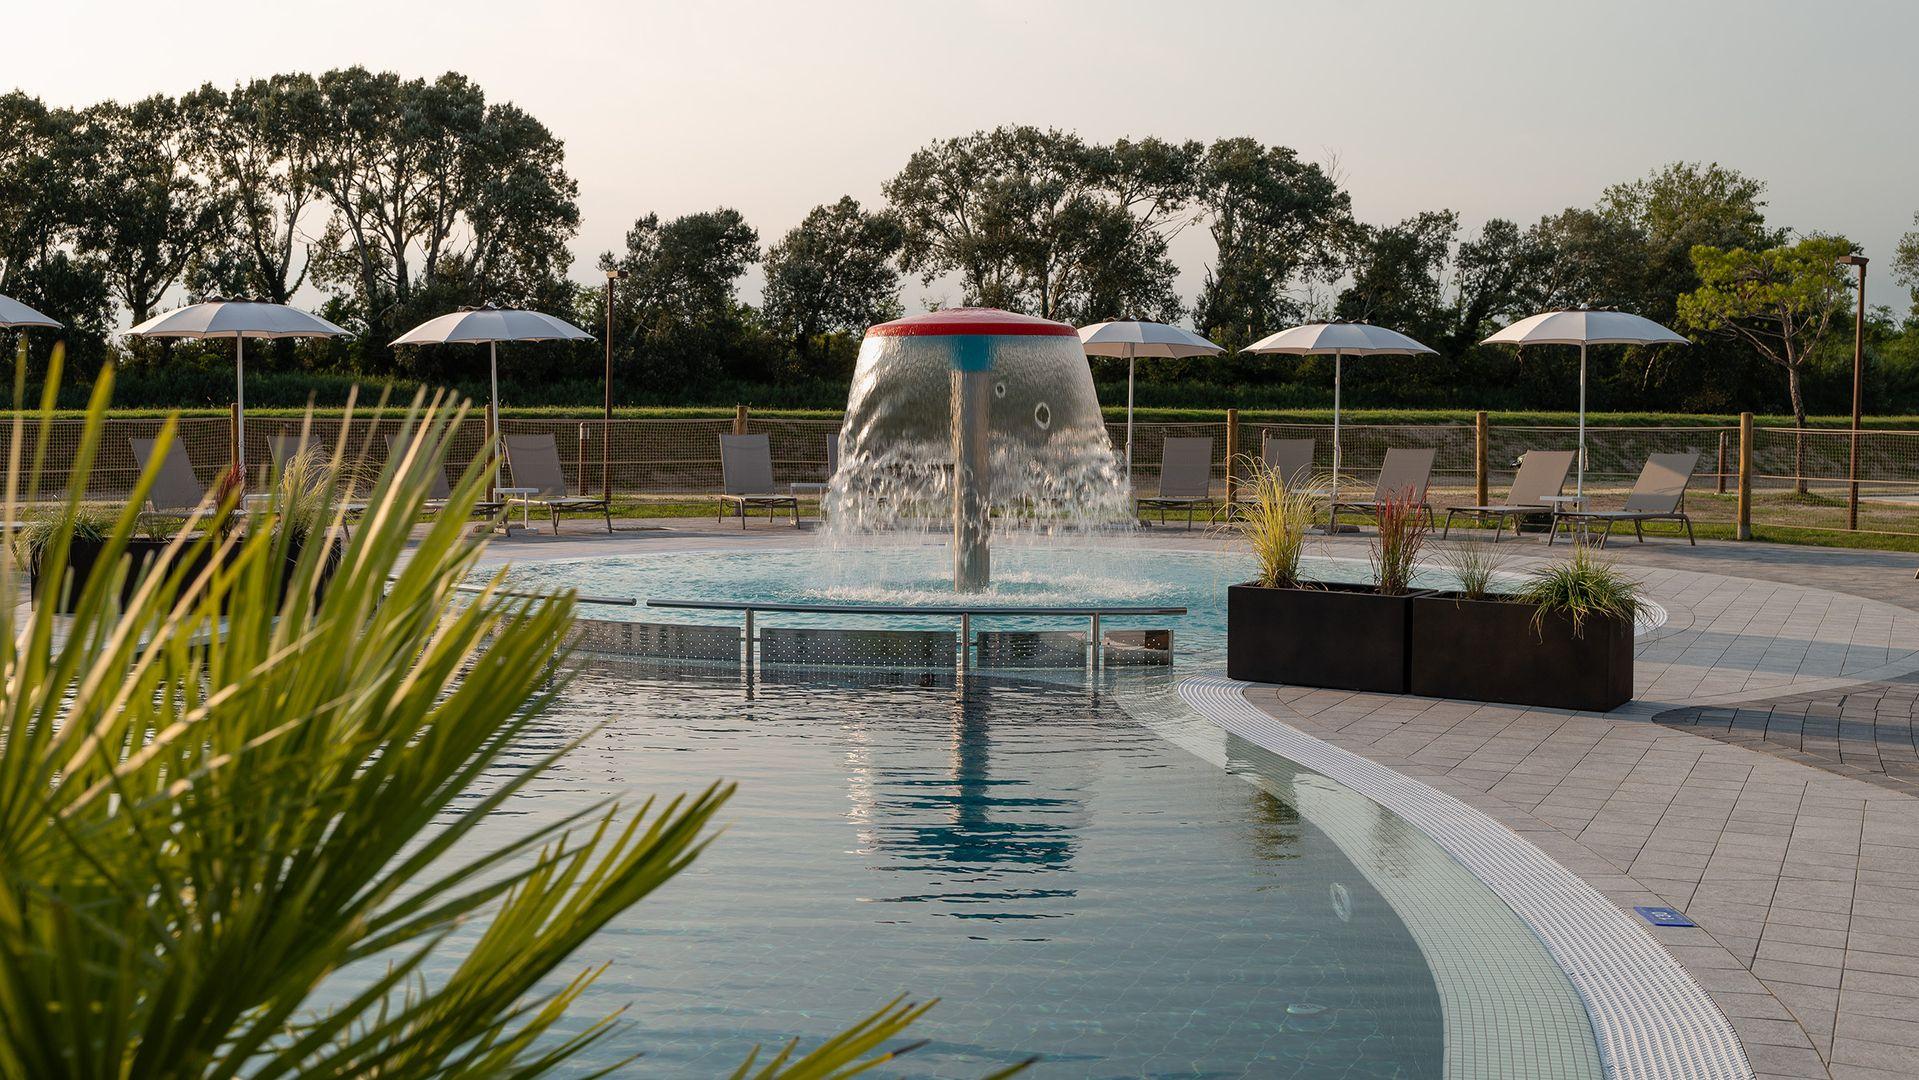 Acqua Azzurra Piscine resort con parco piscine a lignano | marina azzurra resort